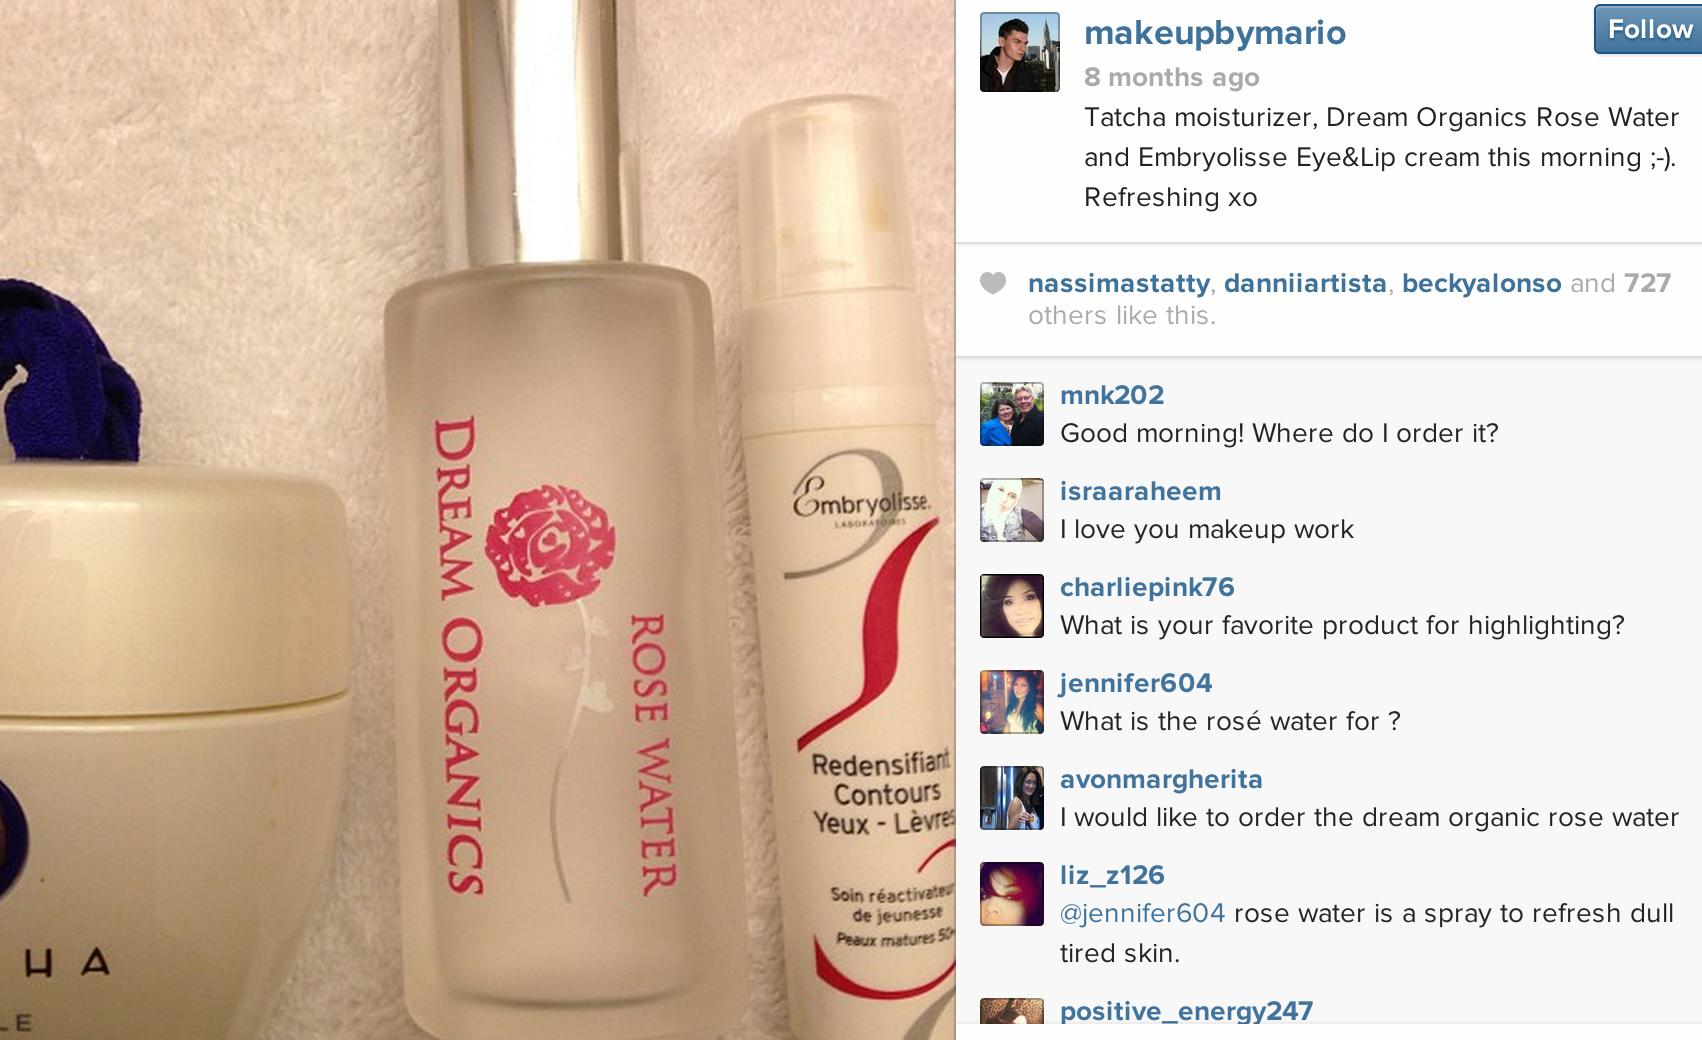 Follow @Mario Dedivanovic posts featuring Dream Organics on Instagram!